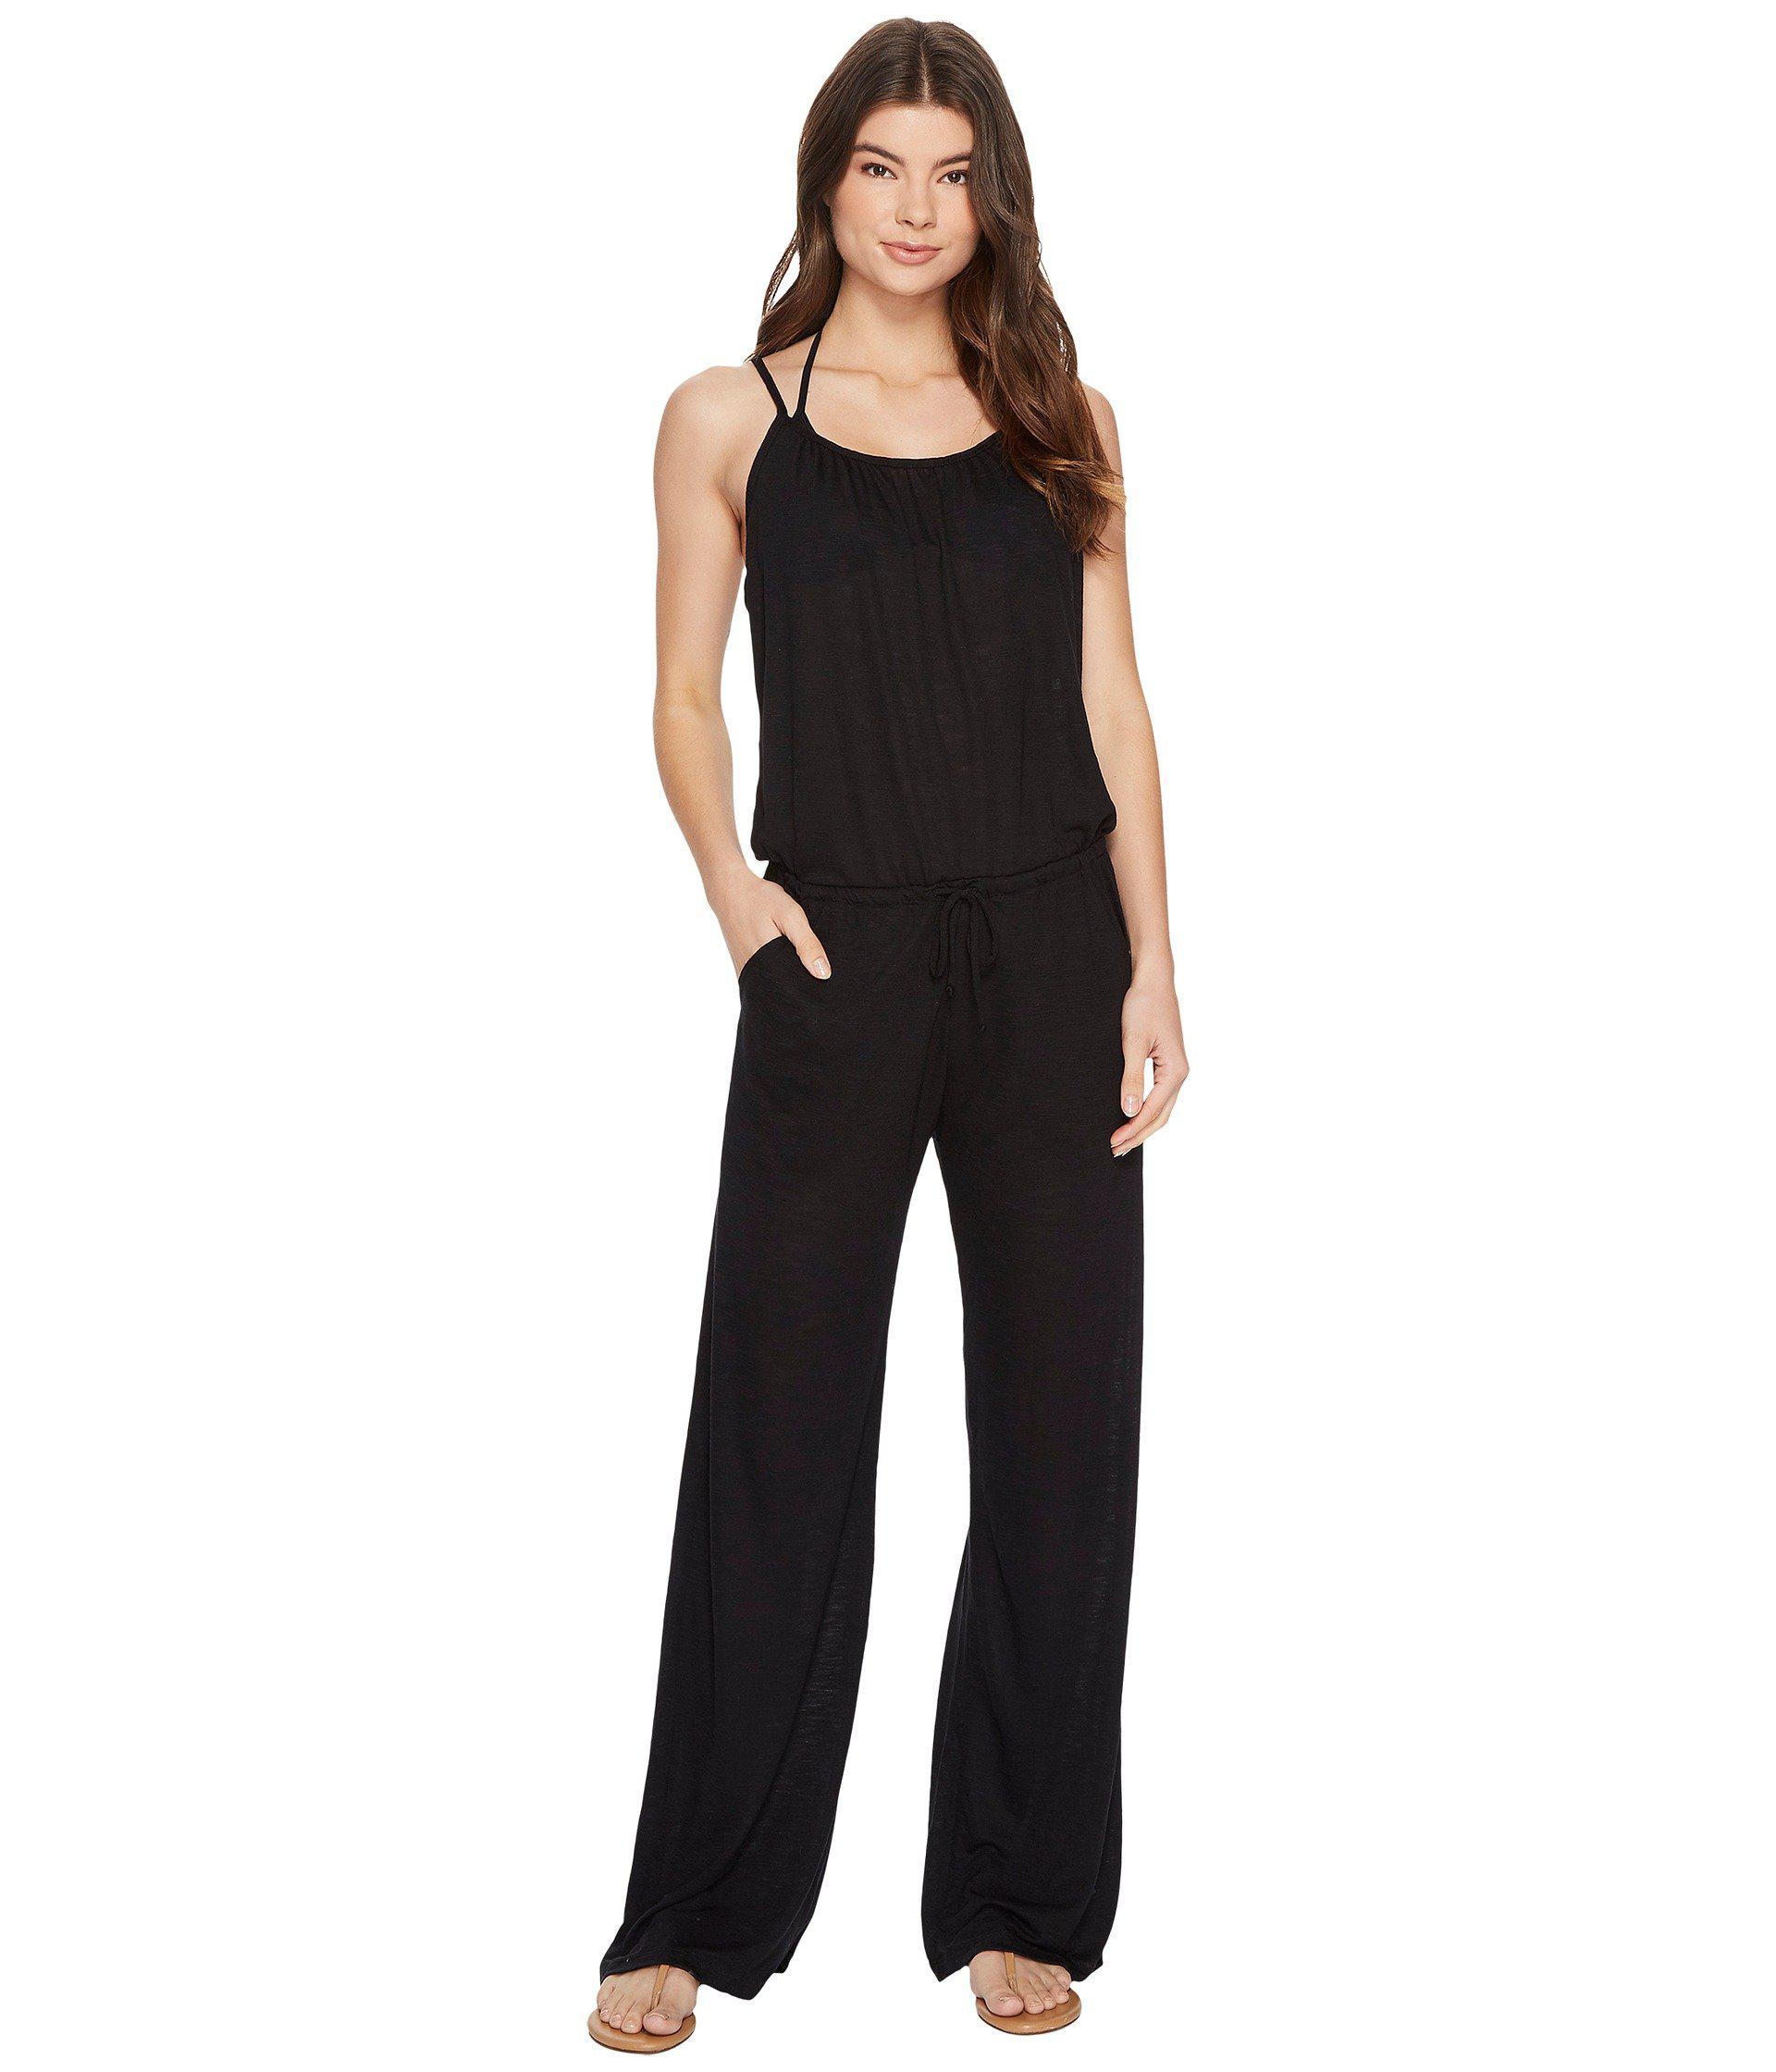 7b00f914e5 Becca Breezy Basics Jumpsuit Cover-up in Black - Lyst